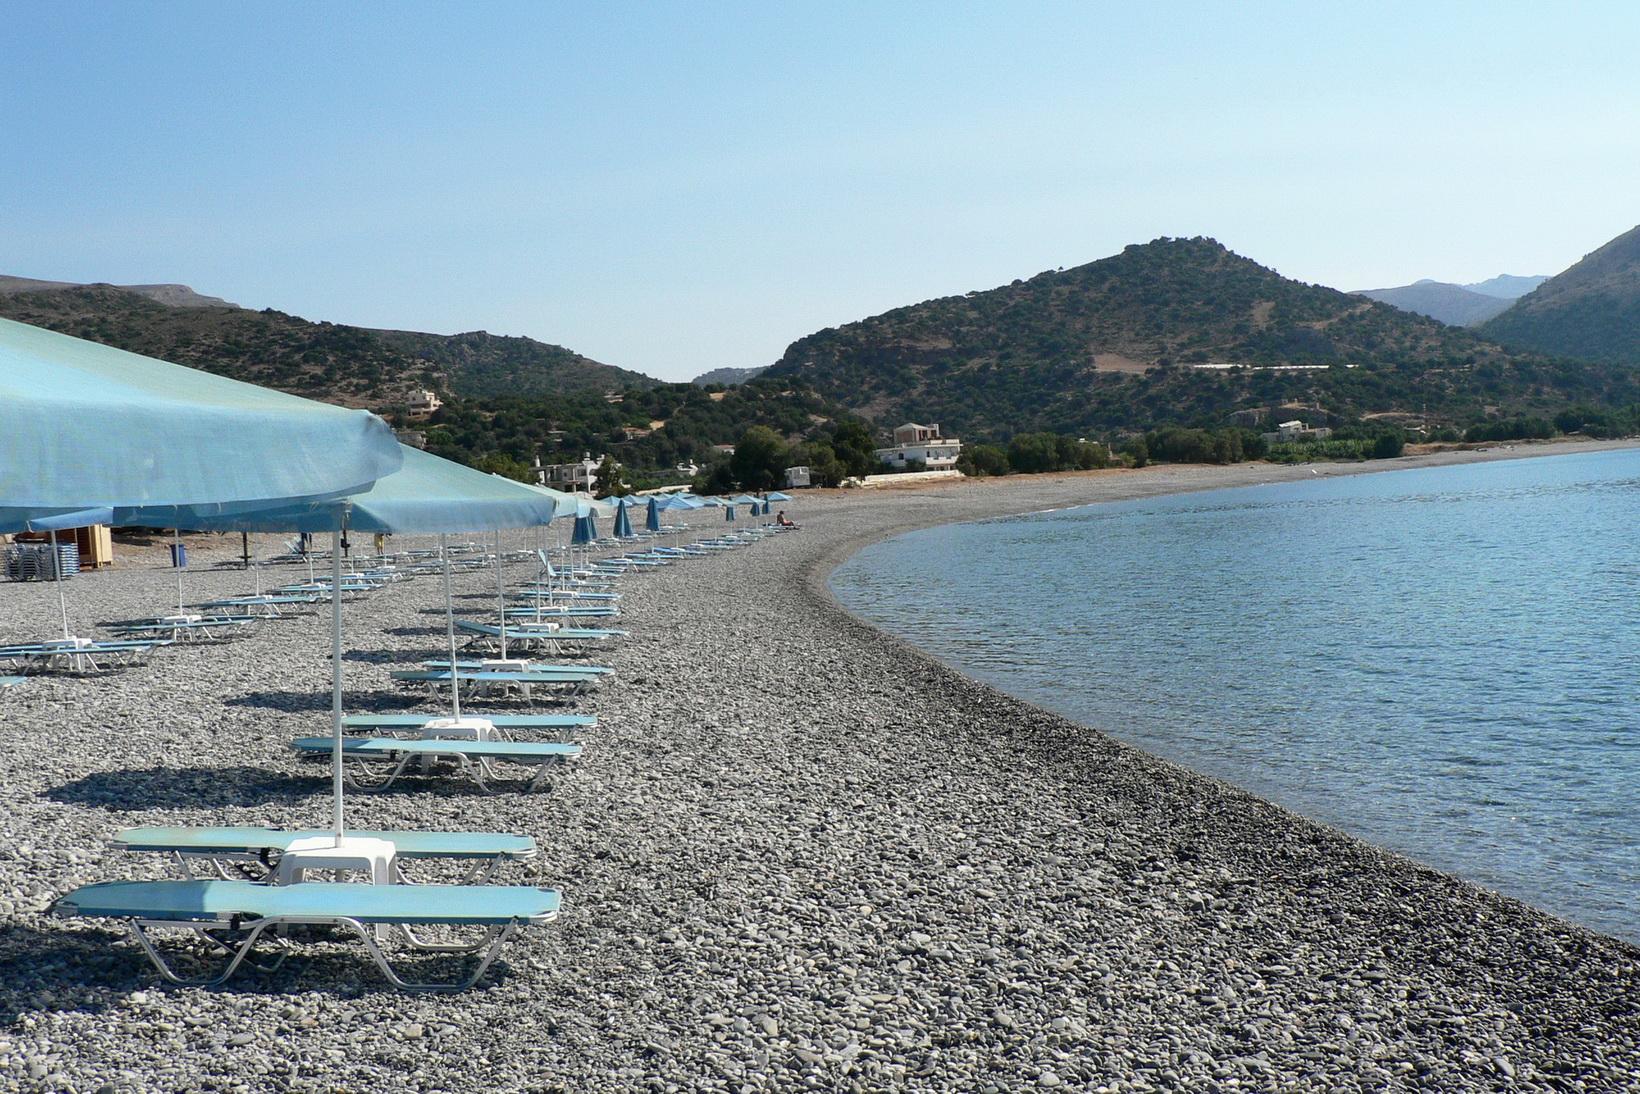 paleochora-beaches-stone-beach-01